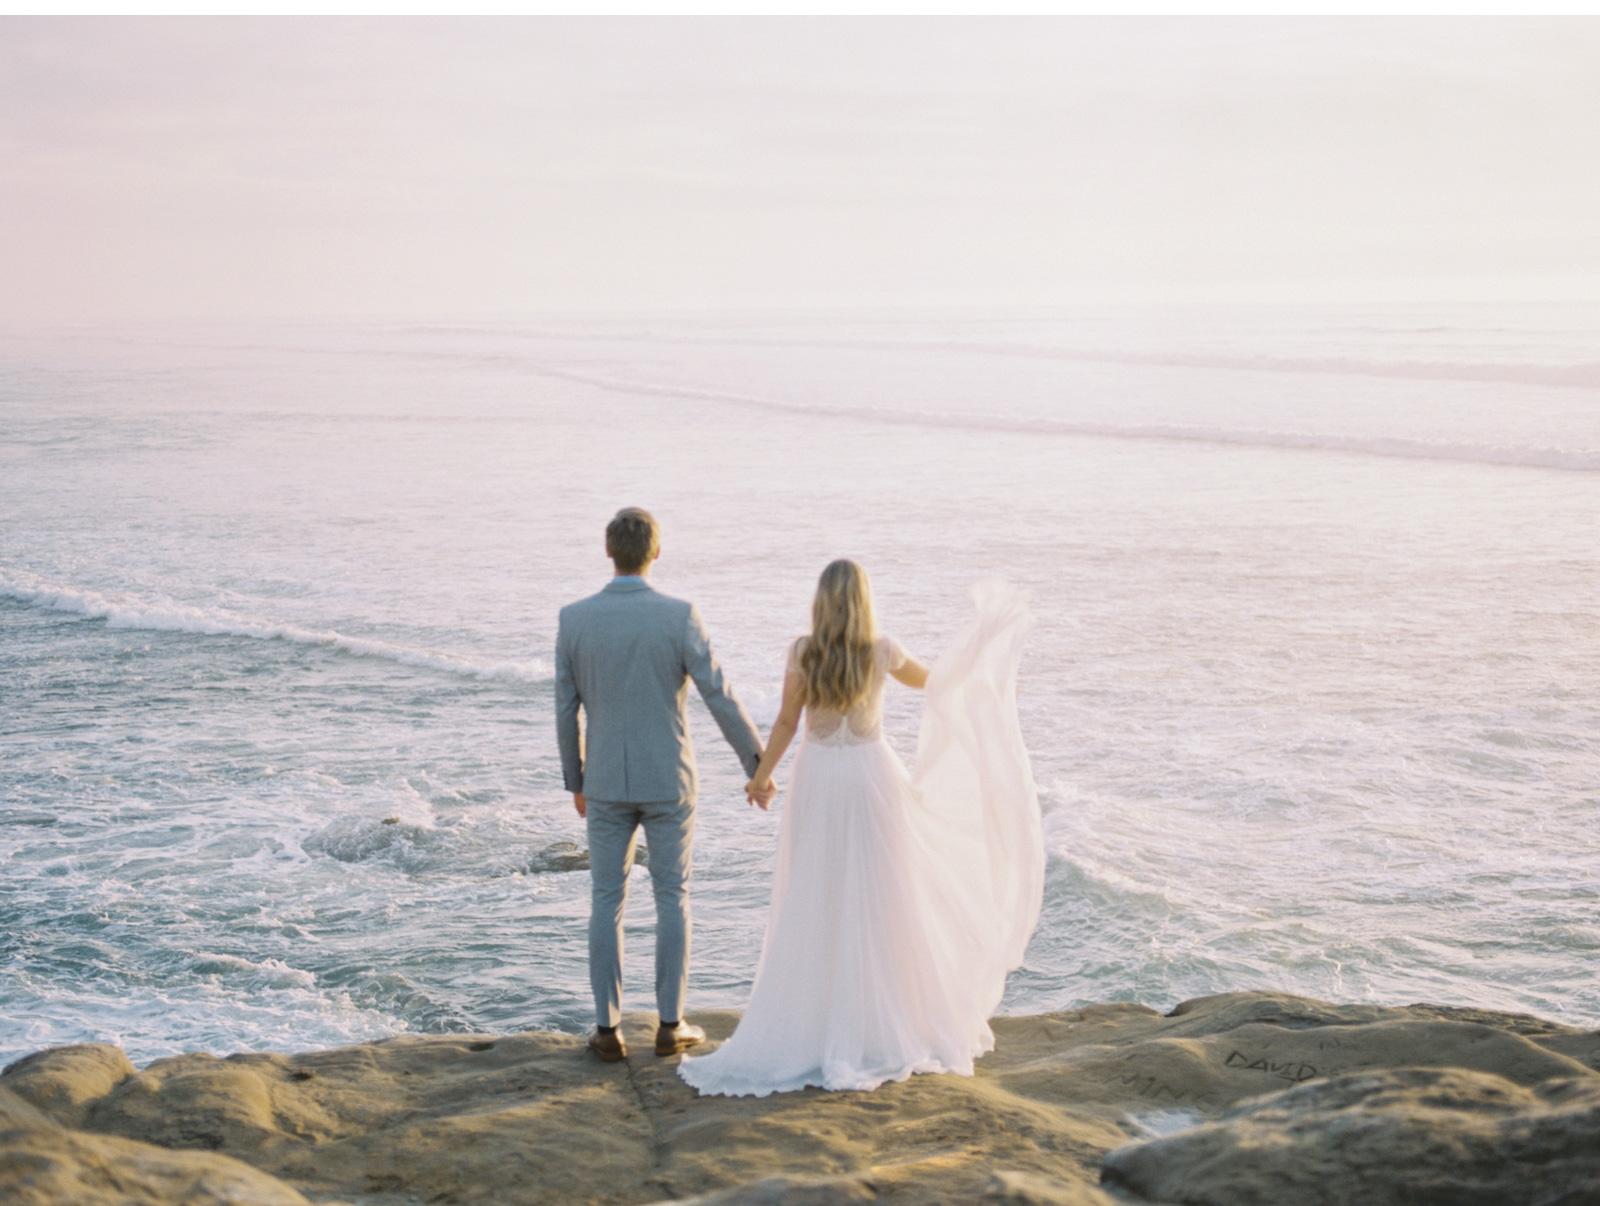 Hawaii-Fine-Art-Wedding-Photographer-Natalie-Schutt-Photography-Style-Me-Pretty_14.jpg